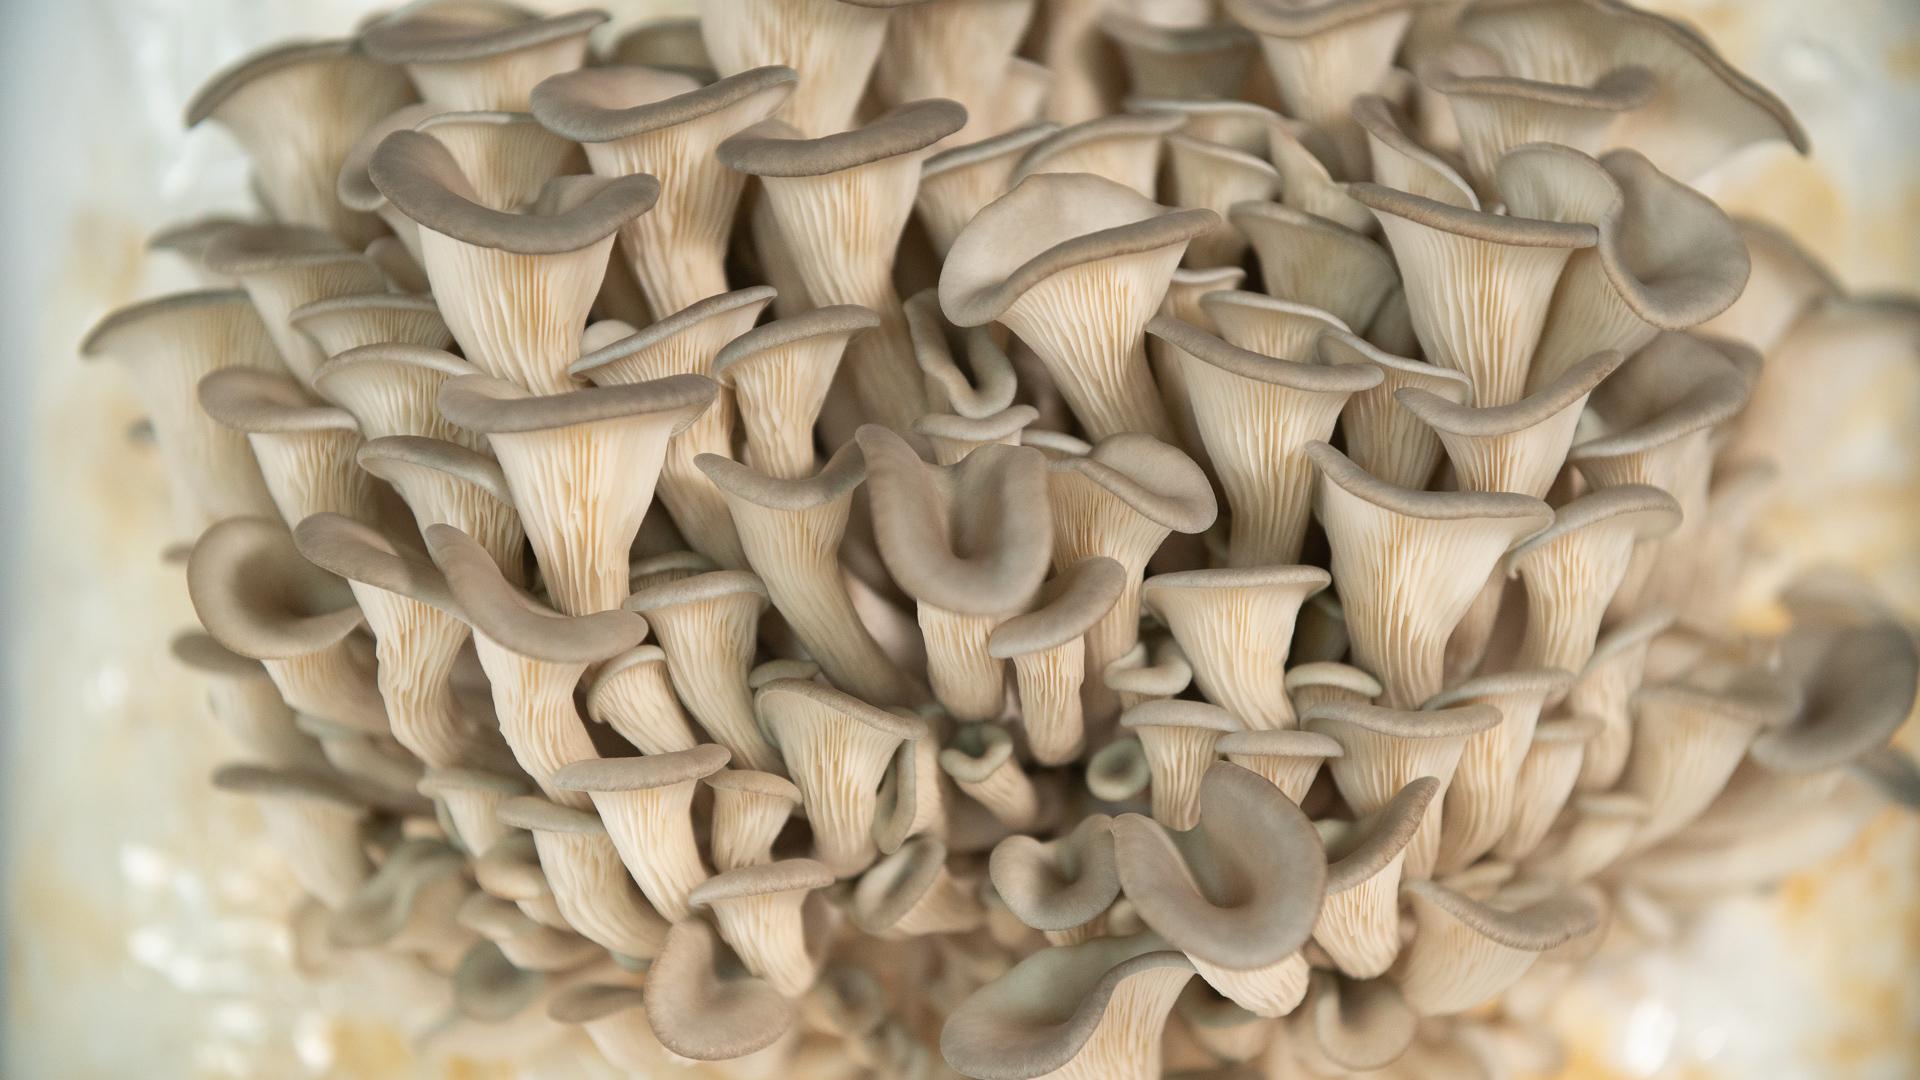 Sawdust Spawn Block - Oyster Mushroom, Blue Oyster (Pleurotus columbinus)